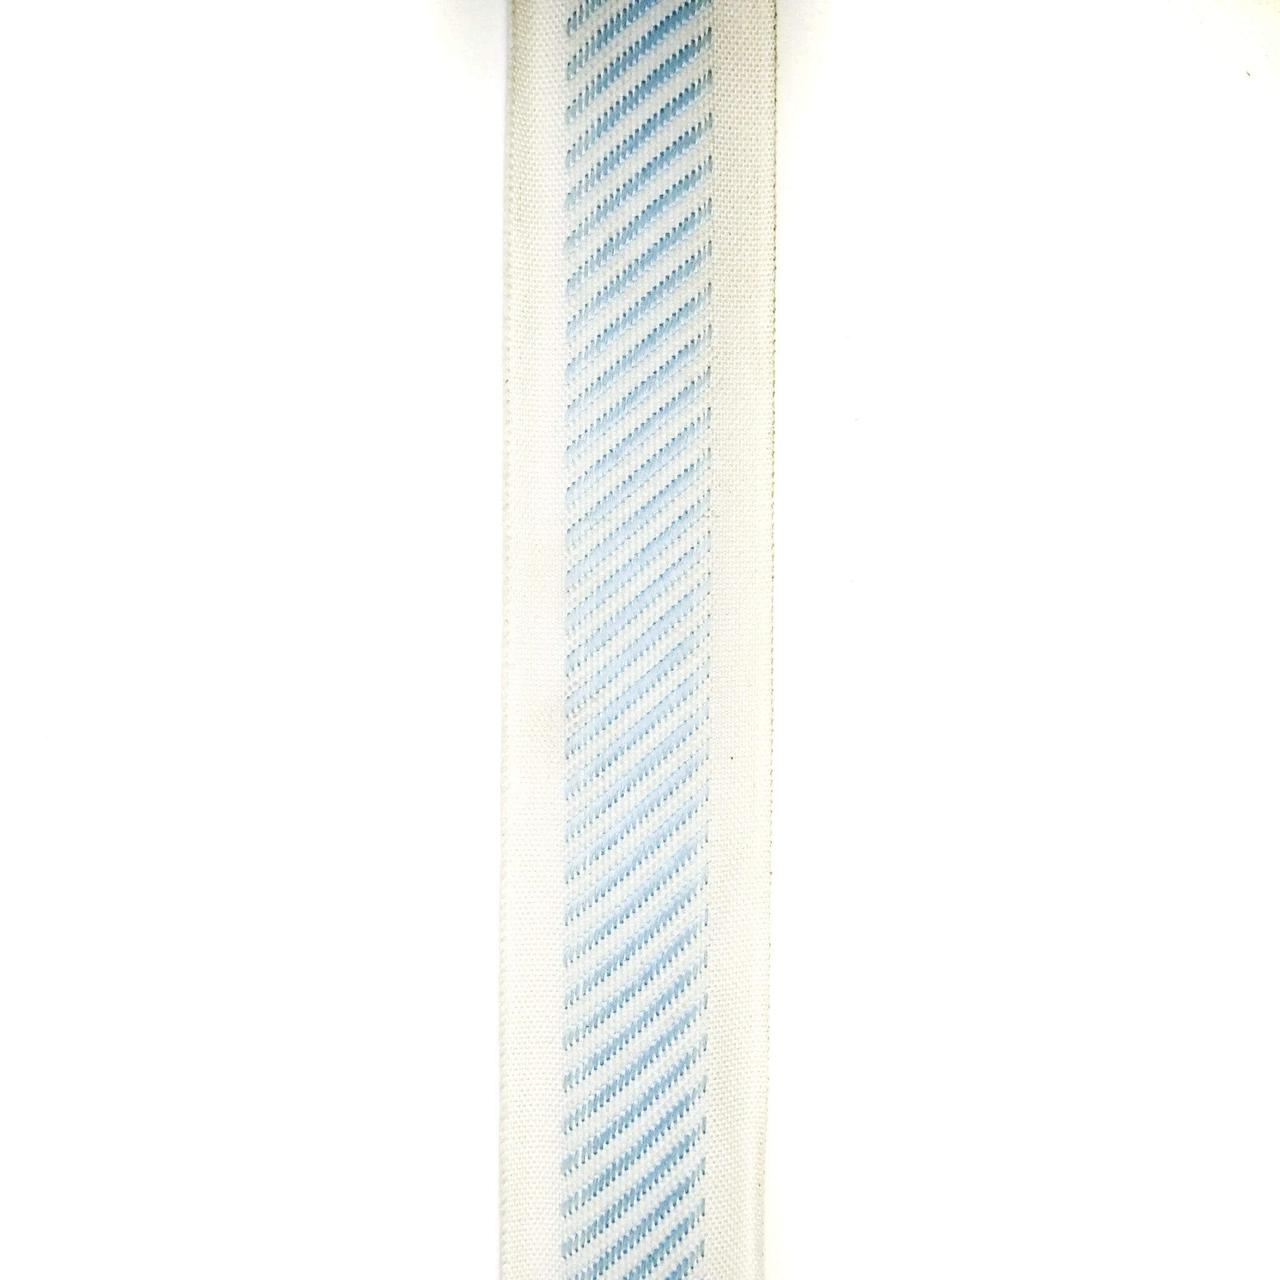 Лента отделочная с украинским орнаментом 36мм (50м/рулон)